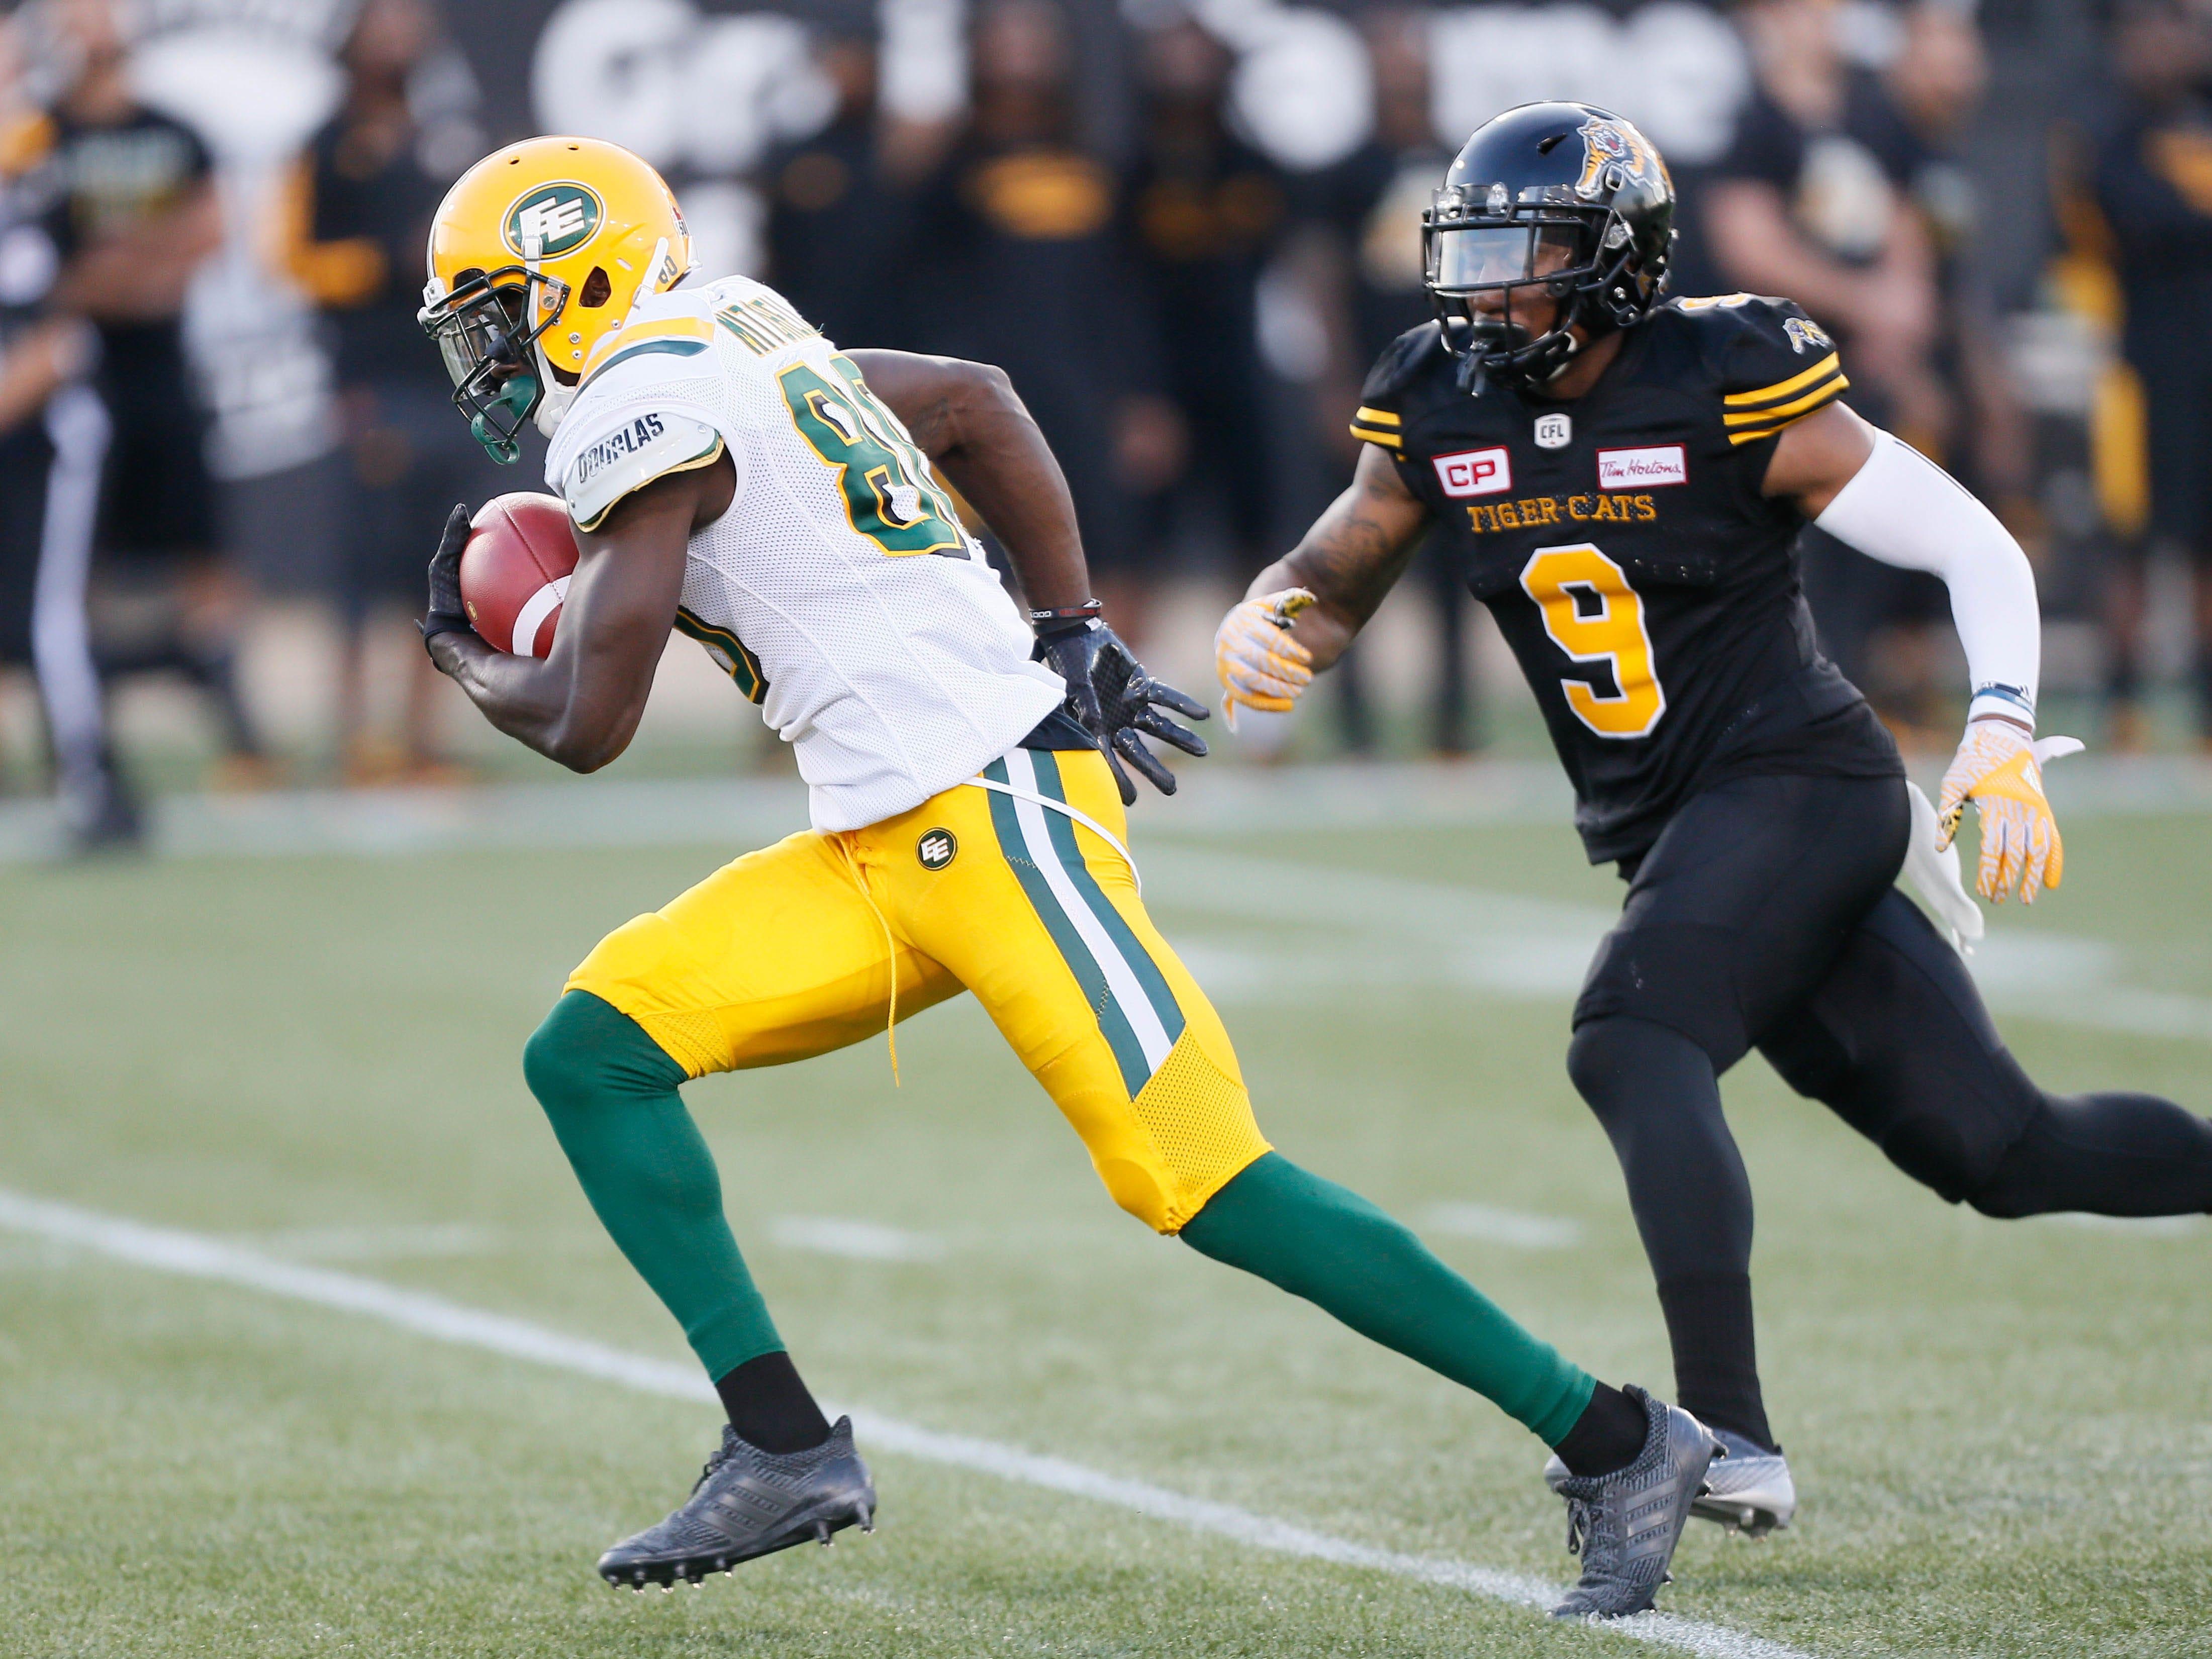 Edmonton Eskimos receiver Bryant Mitchell runs past Hamilton defensive back Khalid Wooten to score a touchdown at Tim Hortons Field.